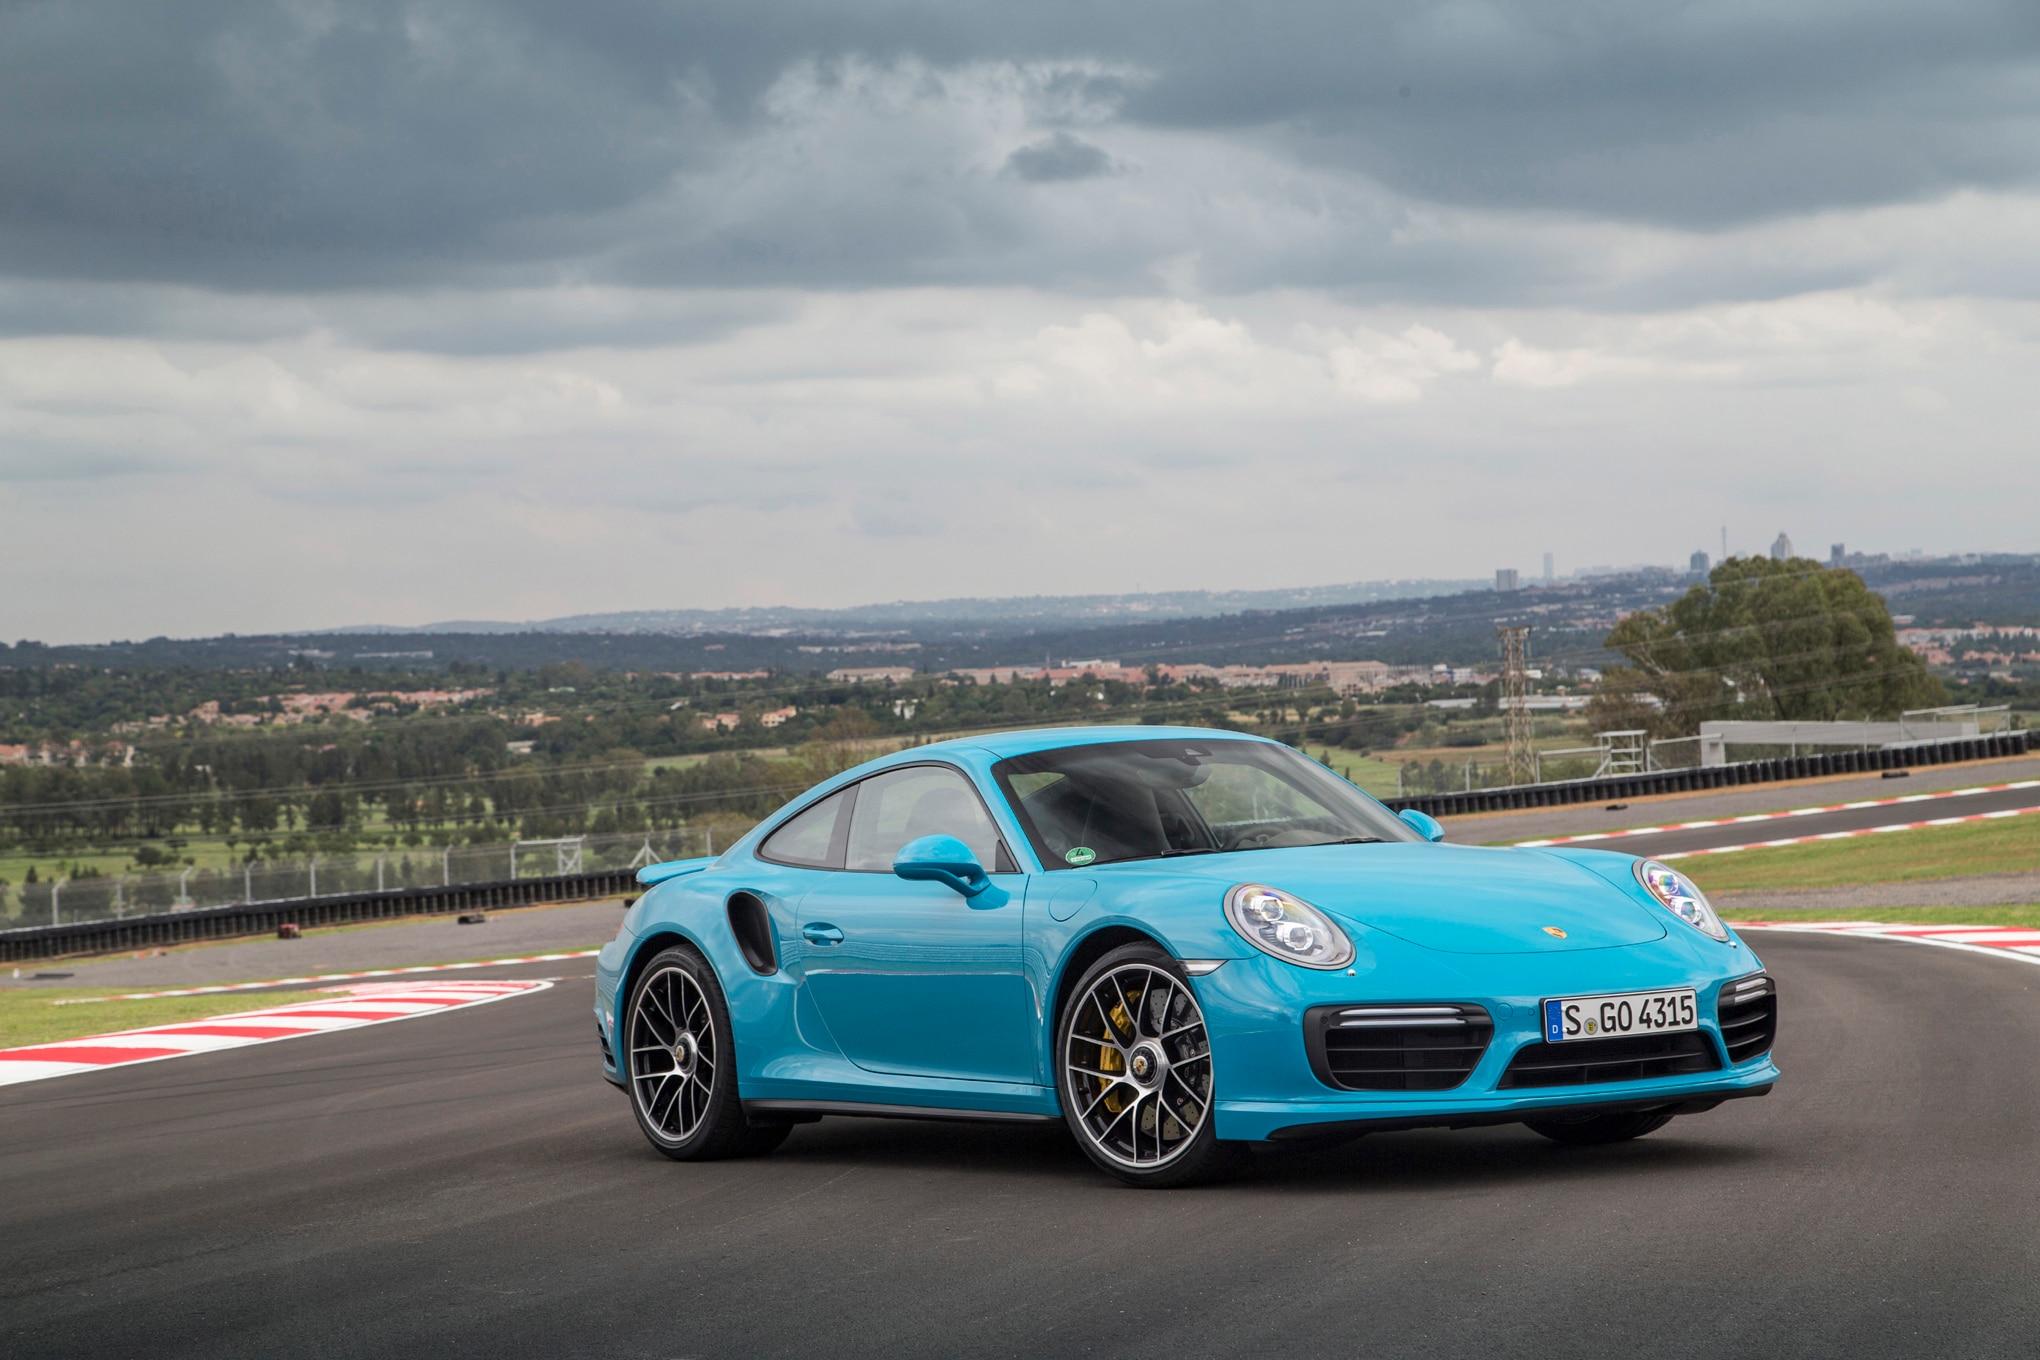 show more - Porsche 911 Turbo S